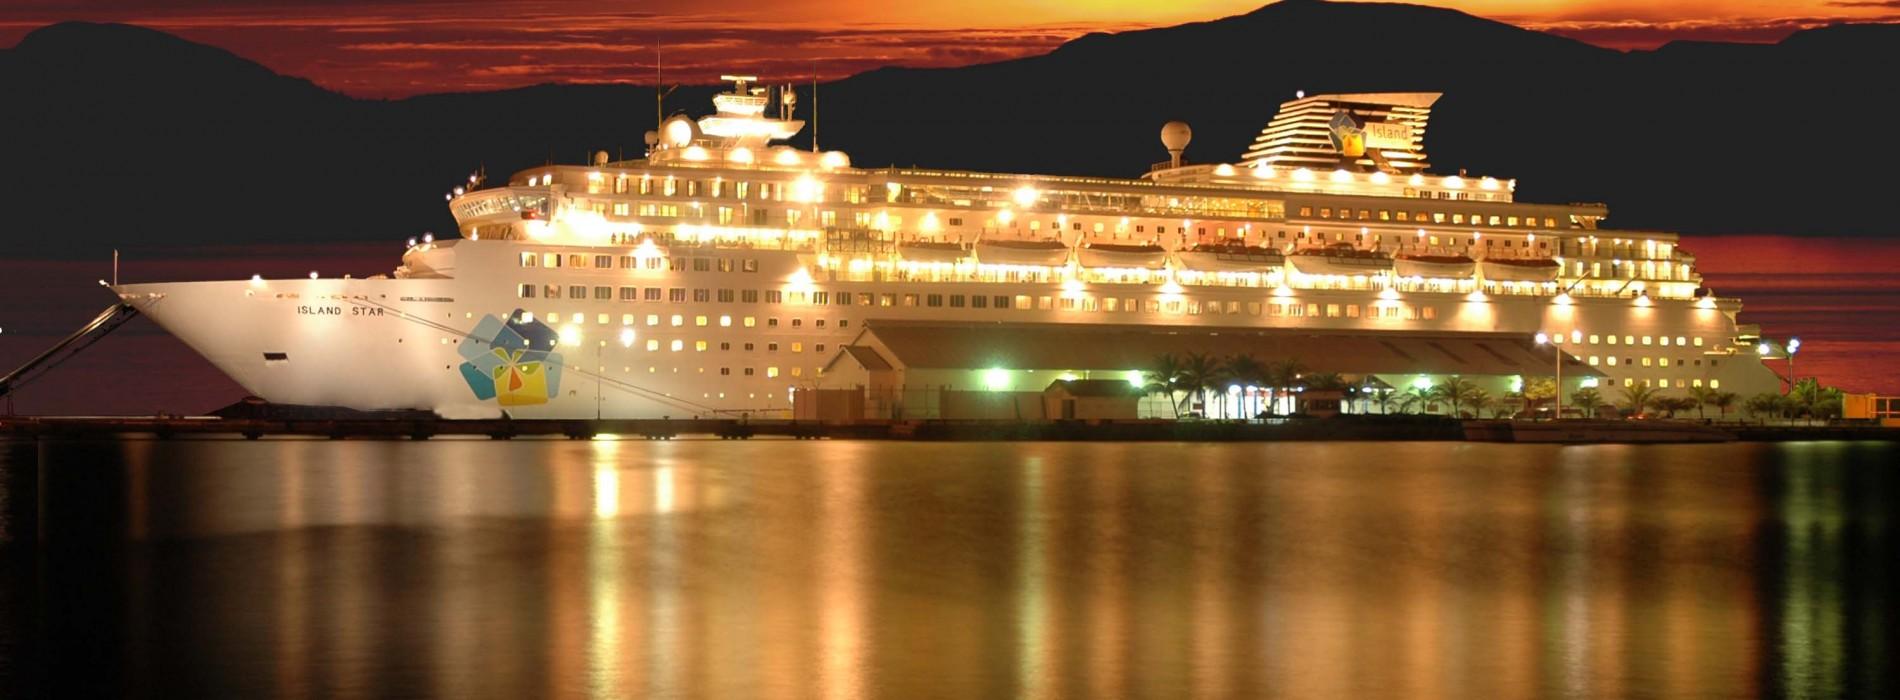 Cruise tourism seeks 5% GST waiver